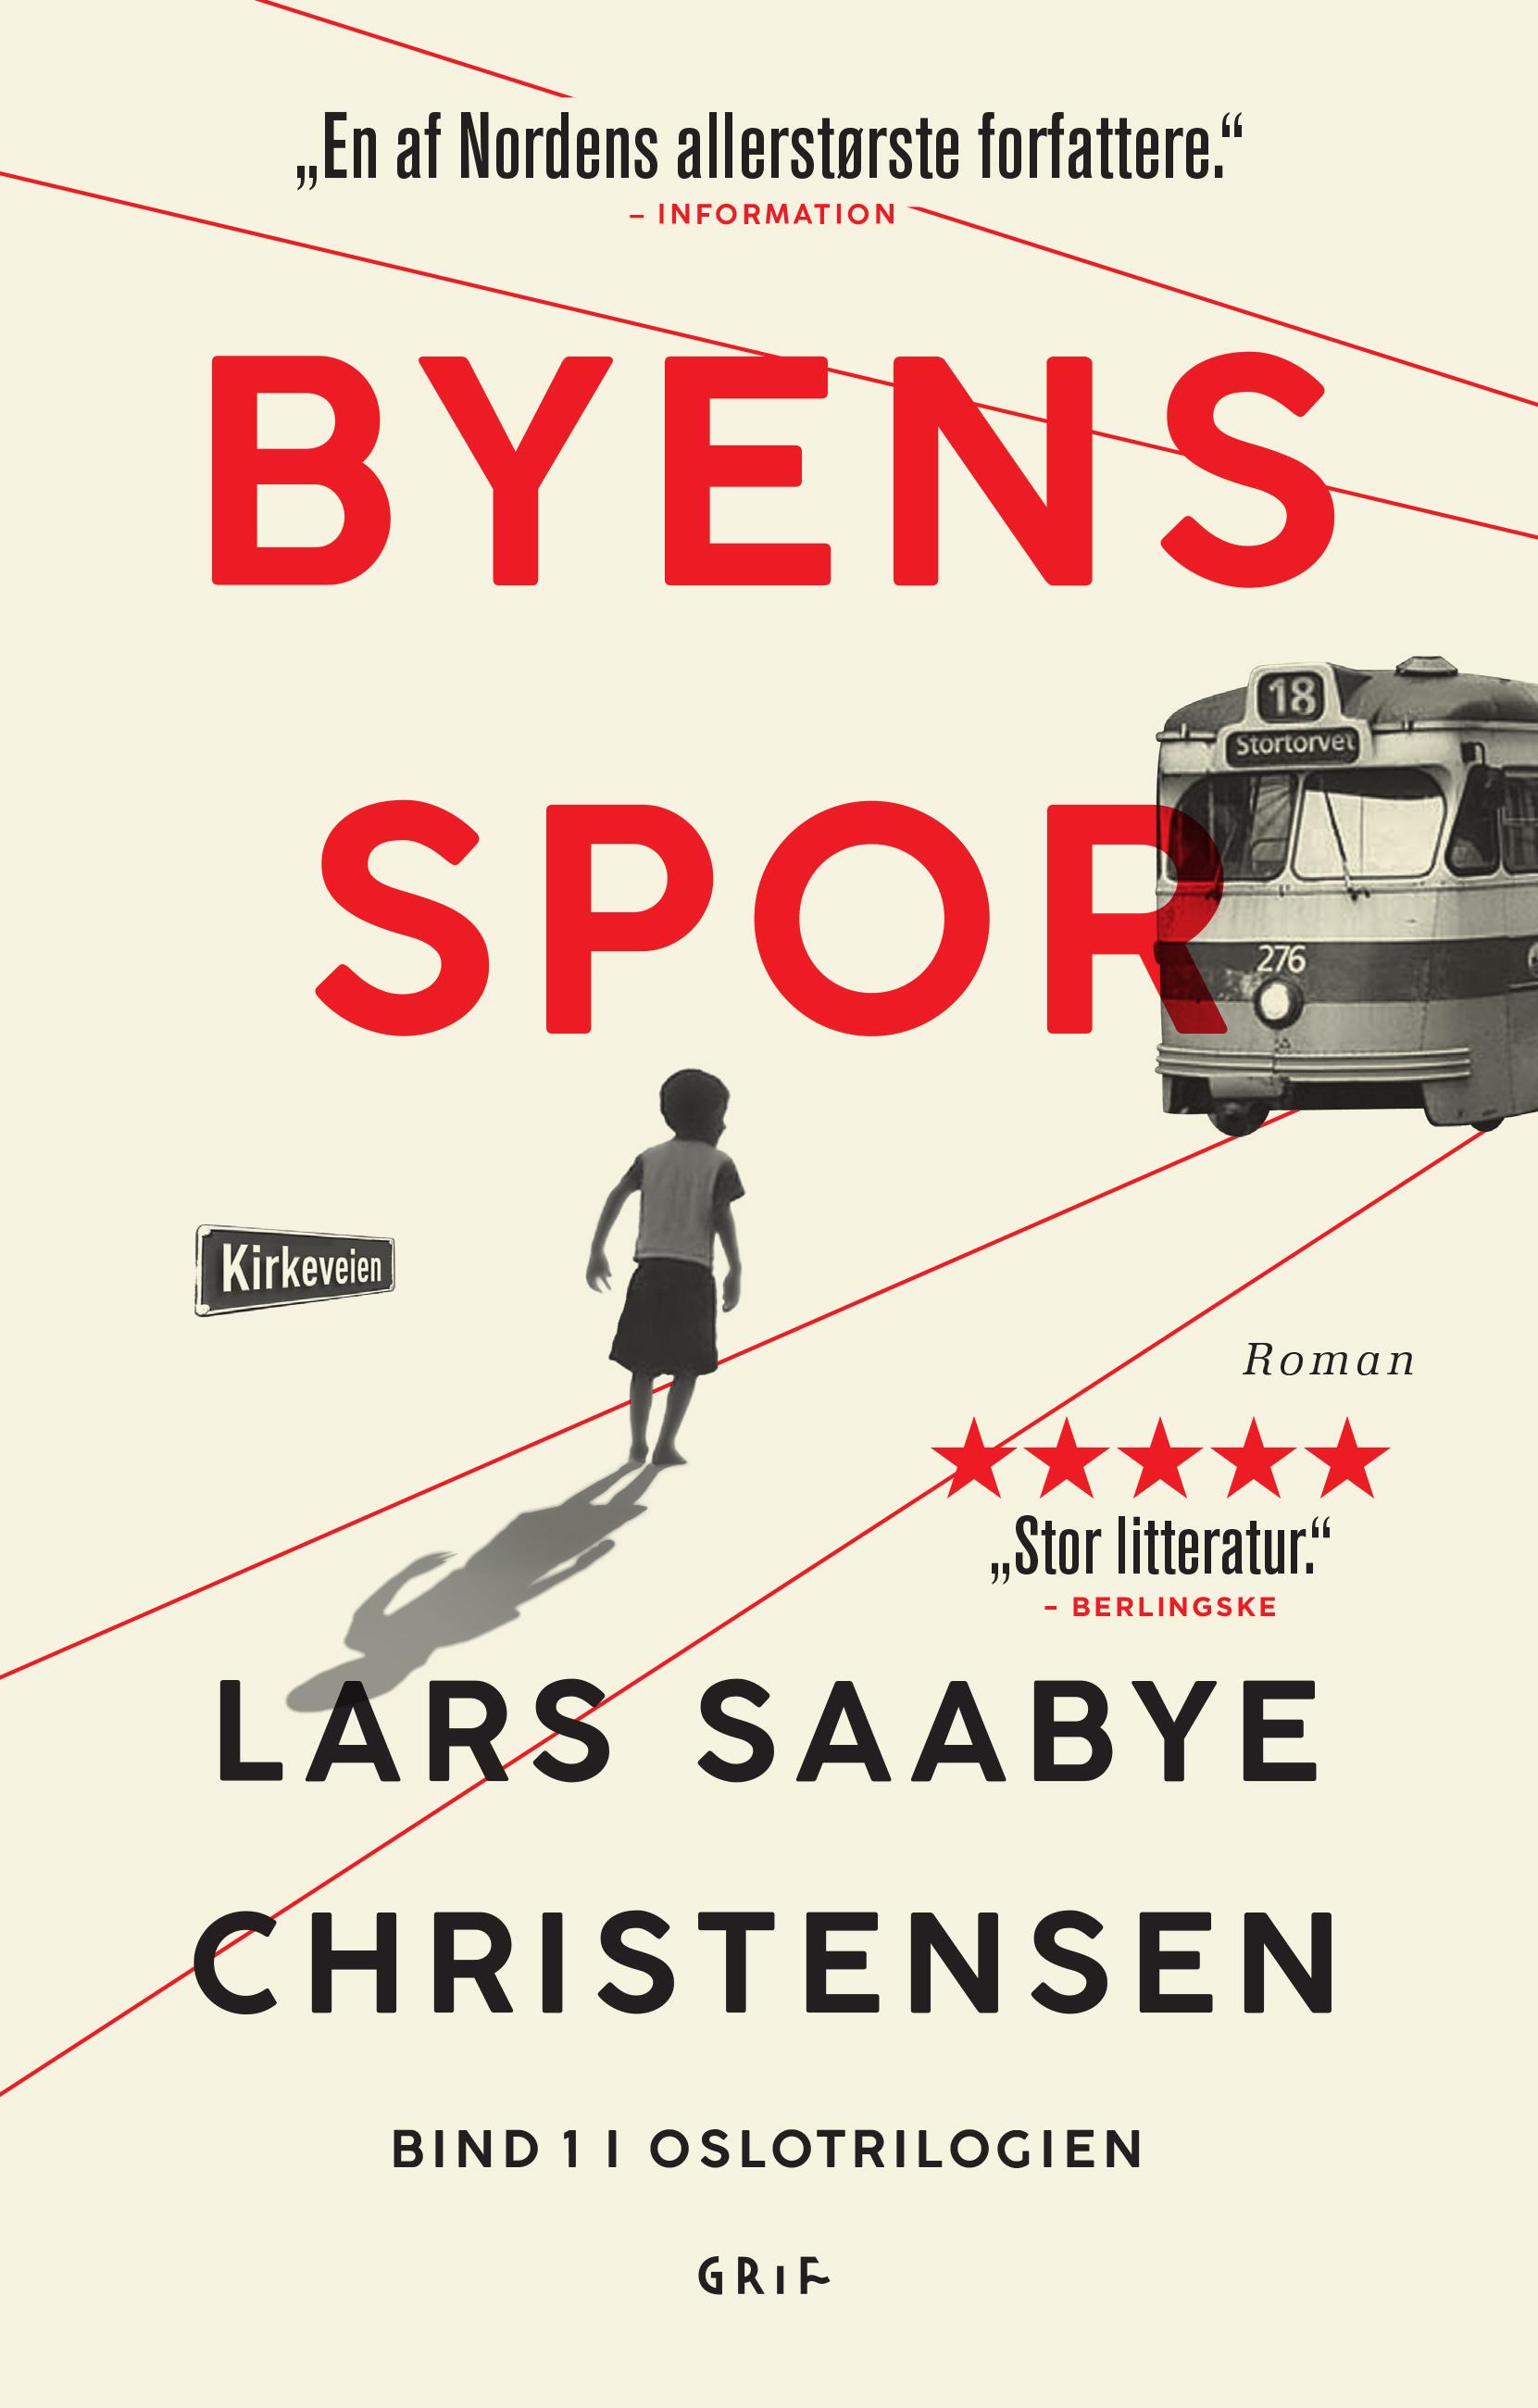 Byens spor: Byens spor 1 PB - Lars Saabye Christensen - Bøger - Grif - 9788793661691 - 10/5-2019